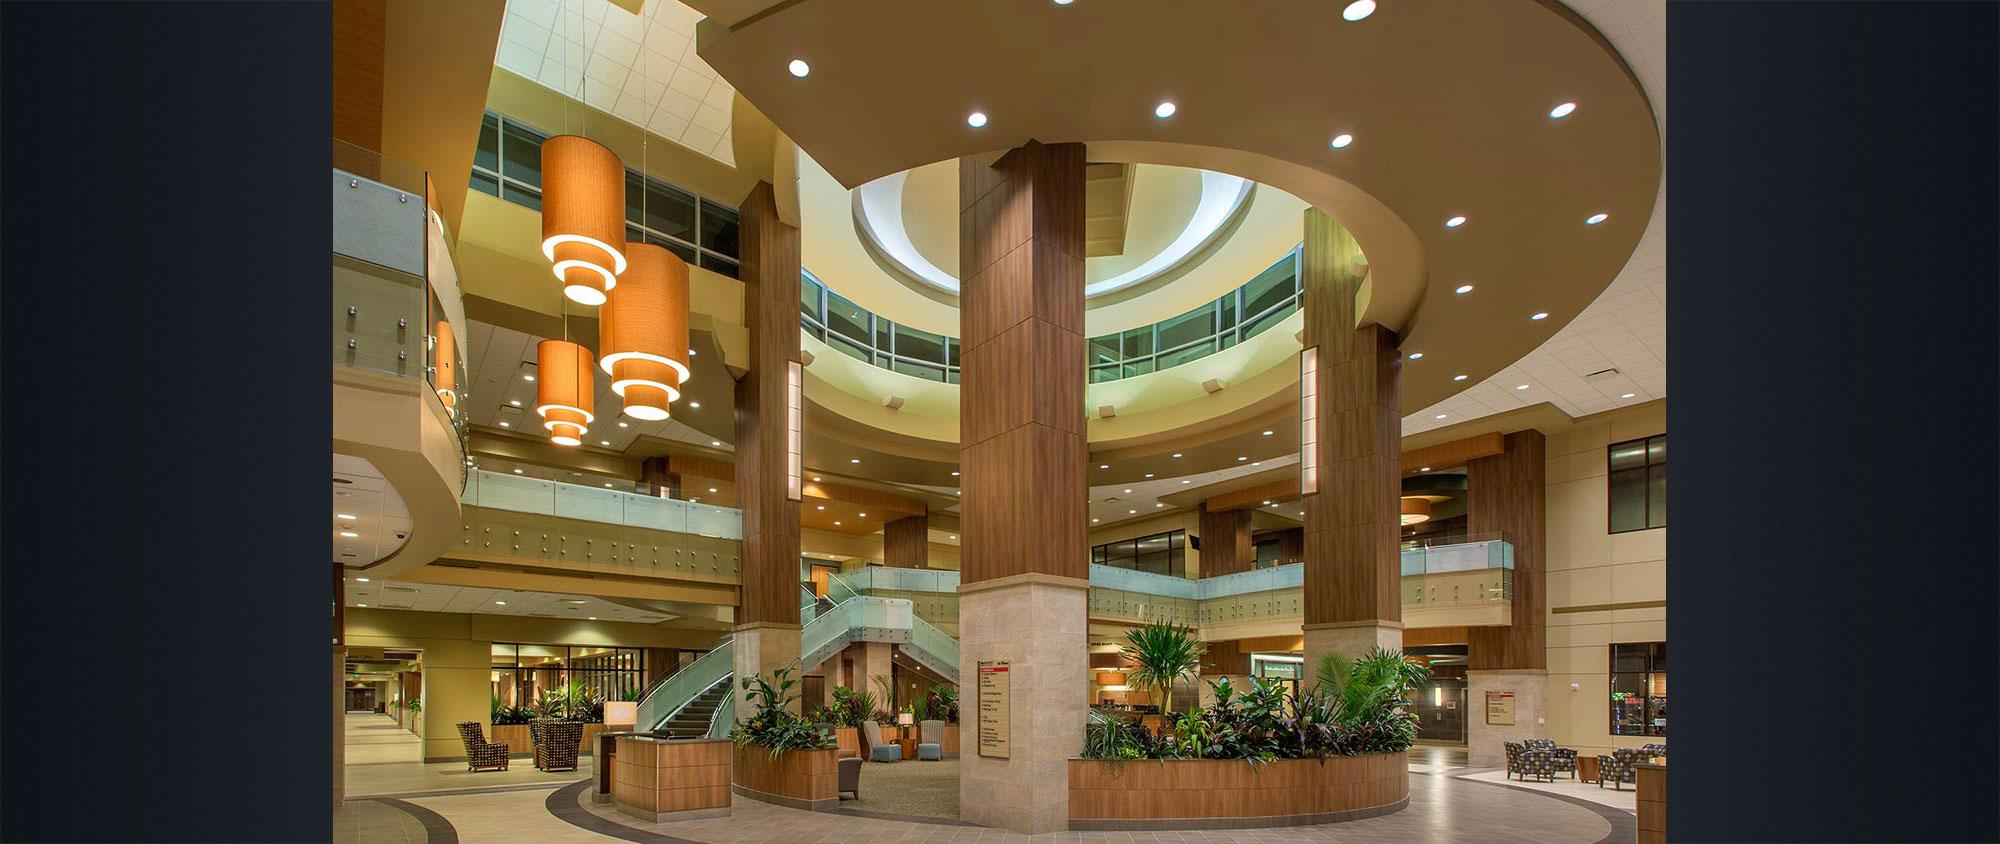 NEA Baptist Memorial Hospital